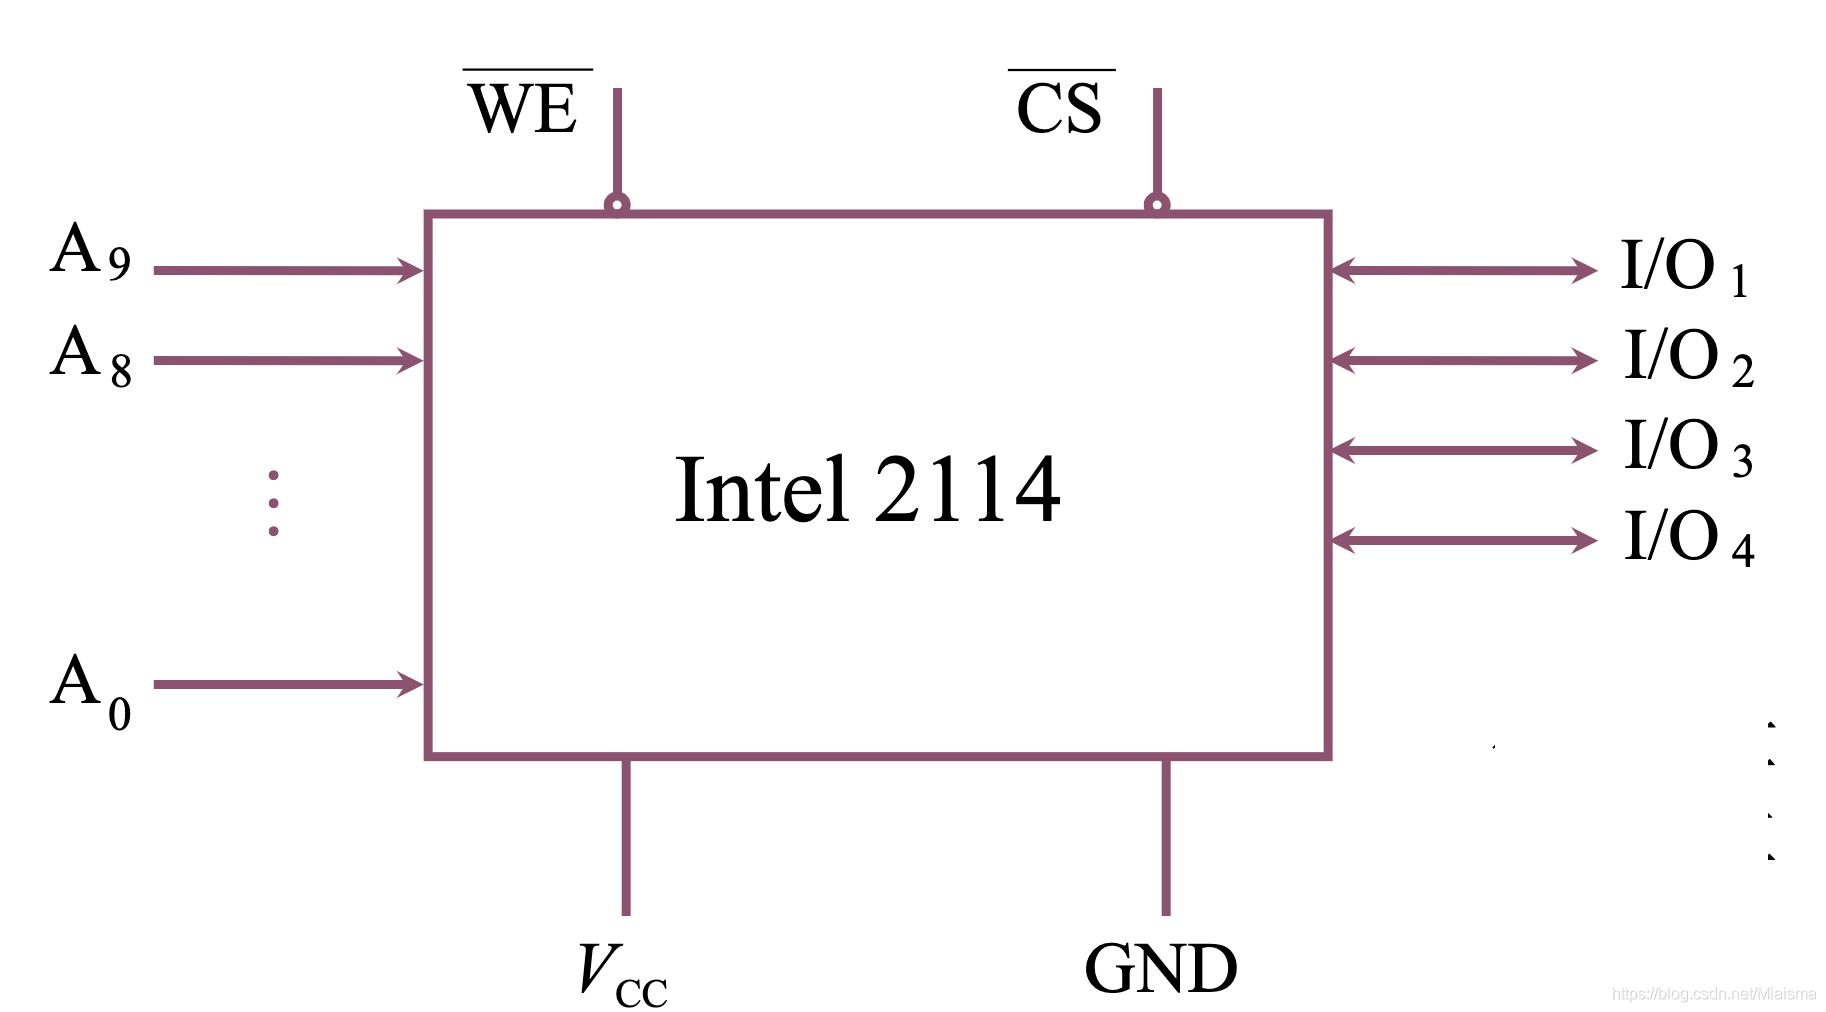 静态RAM芯片Interl2114